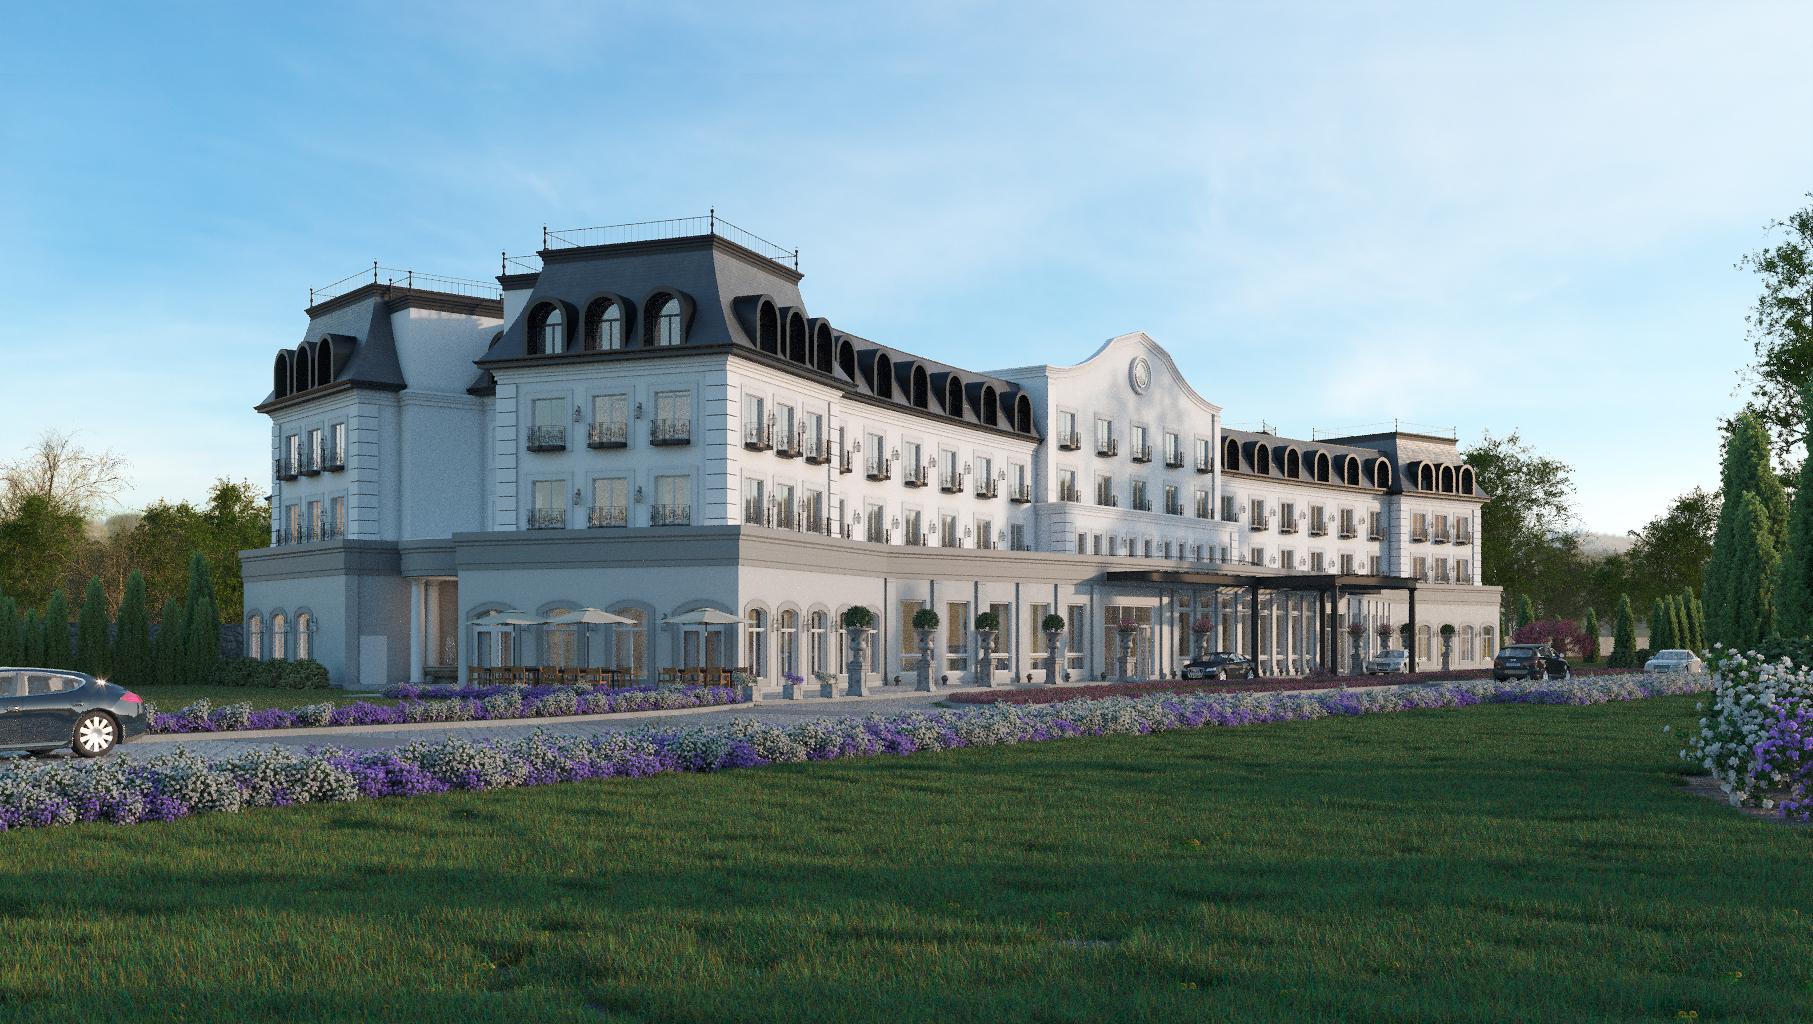 The Chateau Grande Estate Wedding Venue East Brunswick Nj 08816